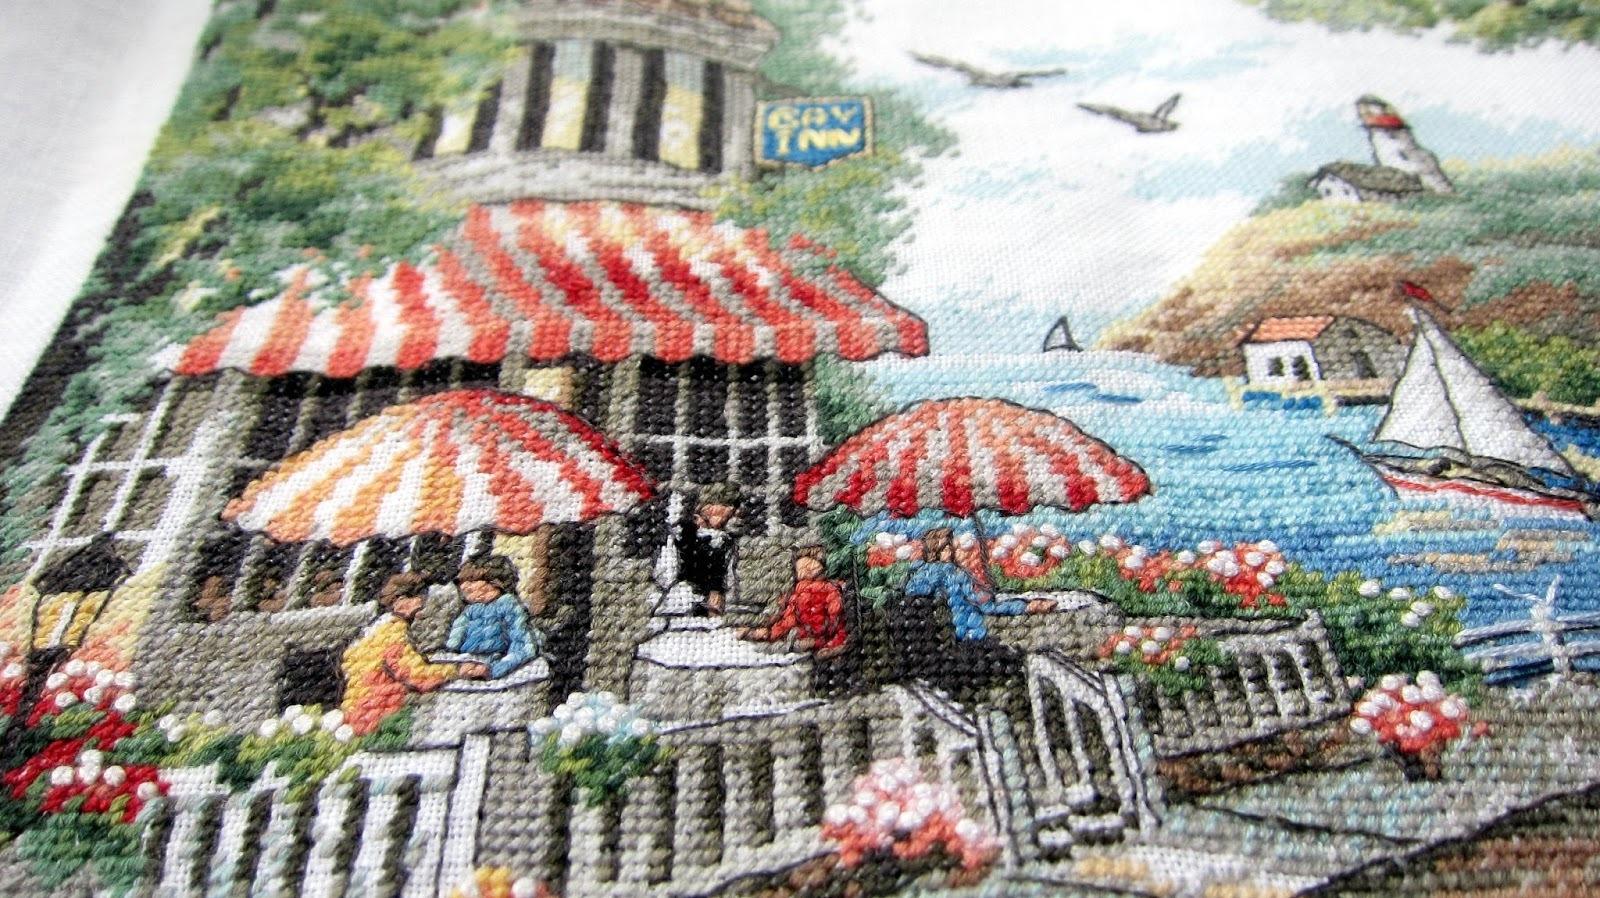 Набор для вышивания. Cafe by the Sea. Кафе у моря. Арт. 35157